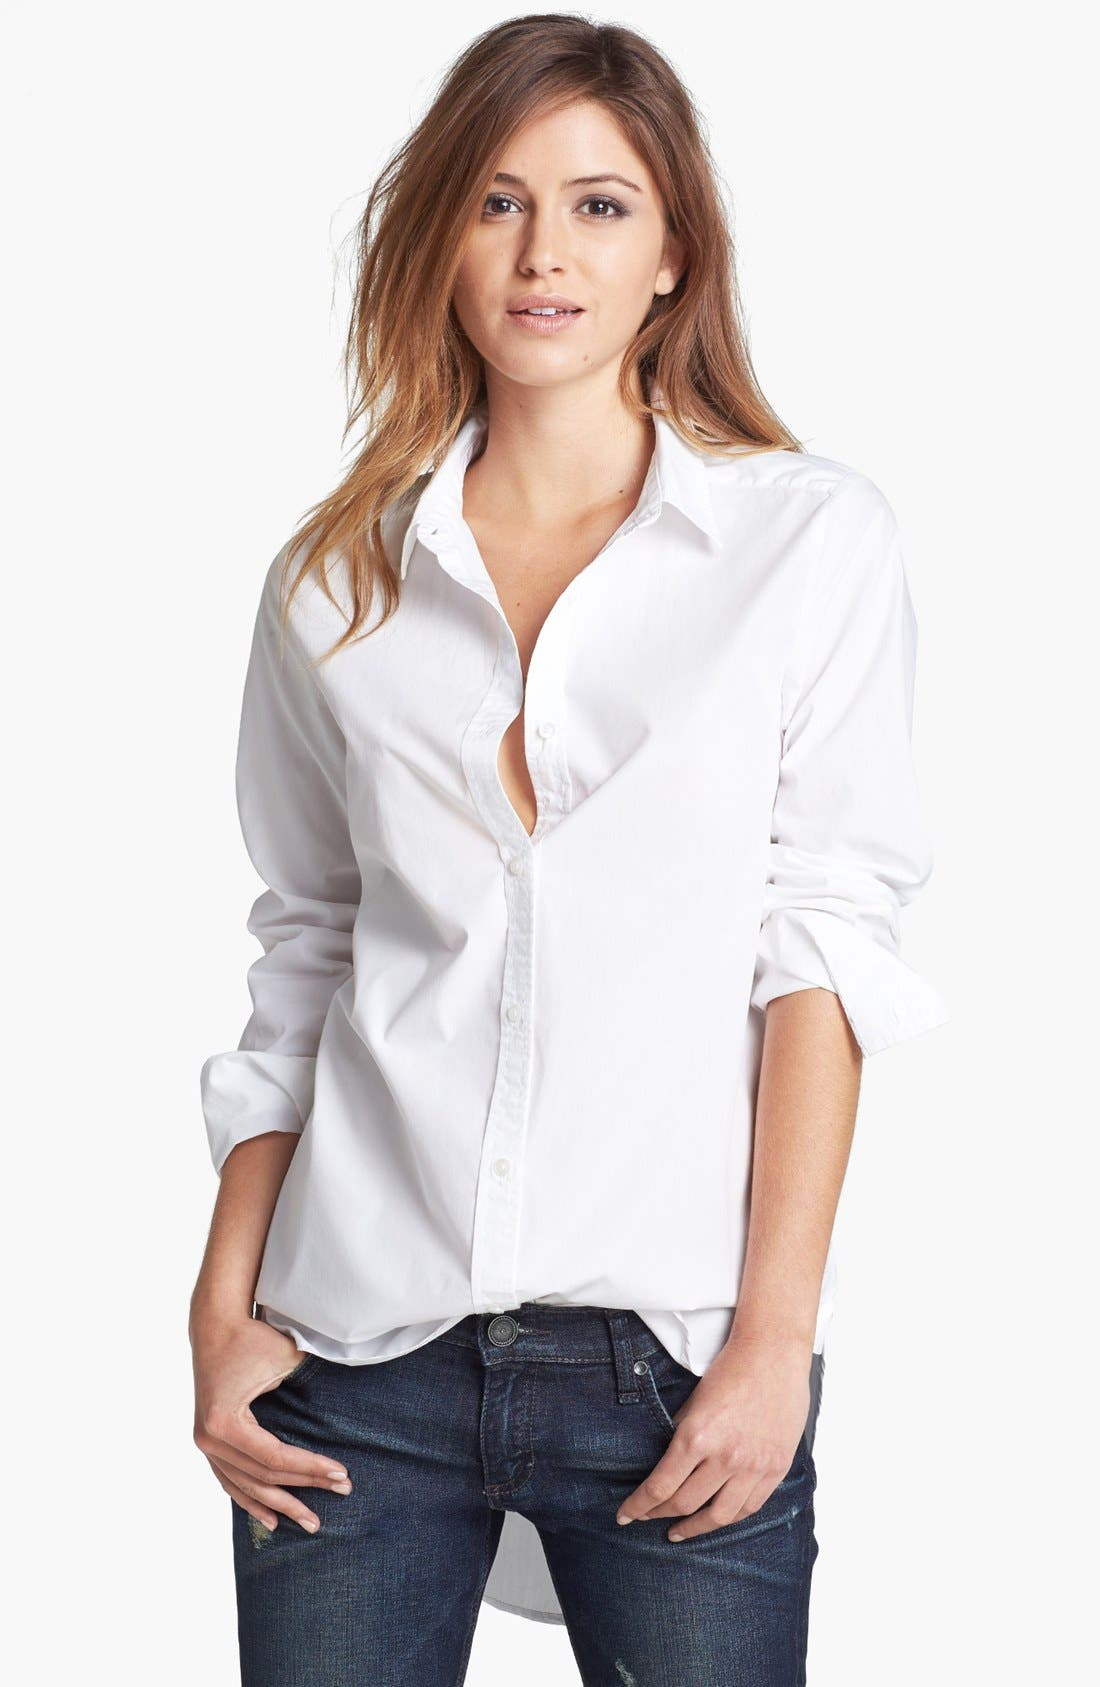 Alternate Image 1 Selected - Tildon 'Clean' Oversized Button-Up Shirt